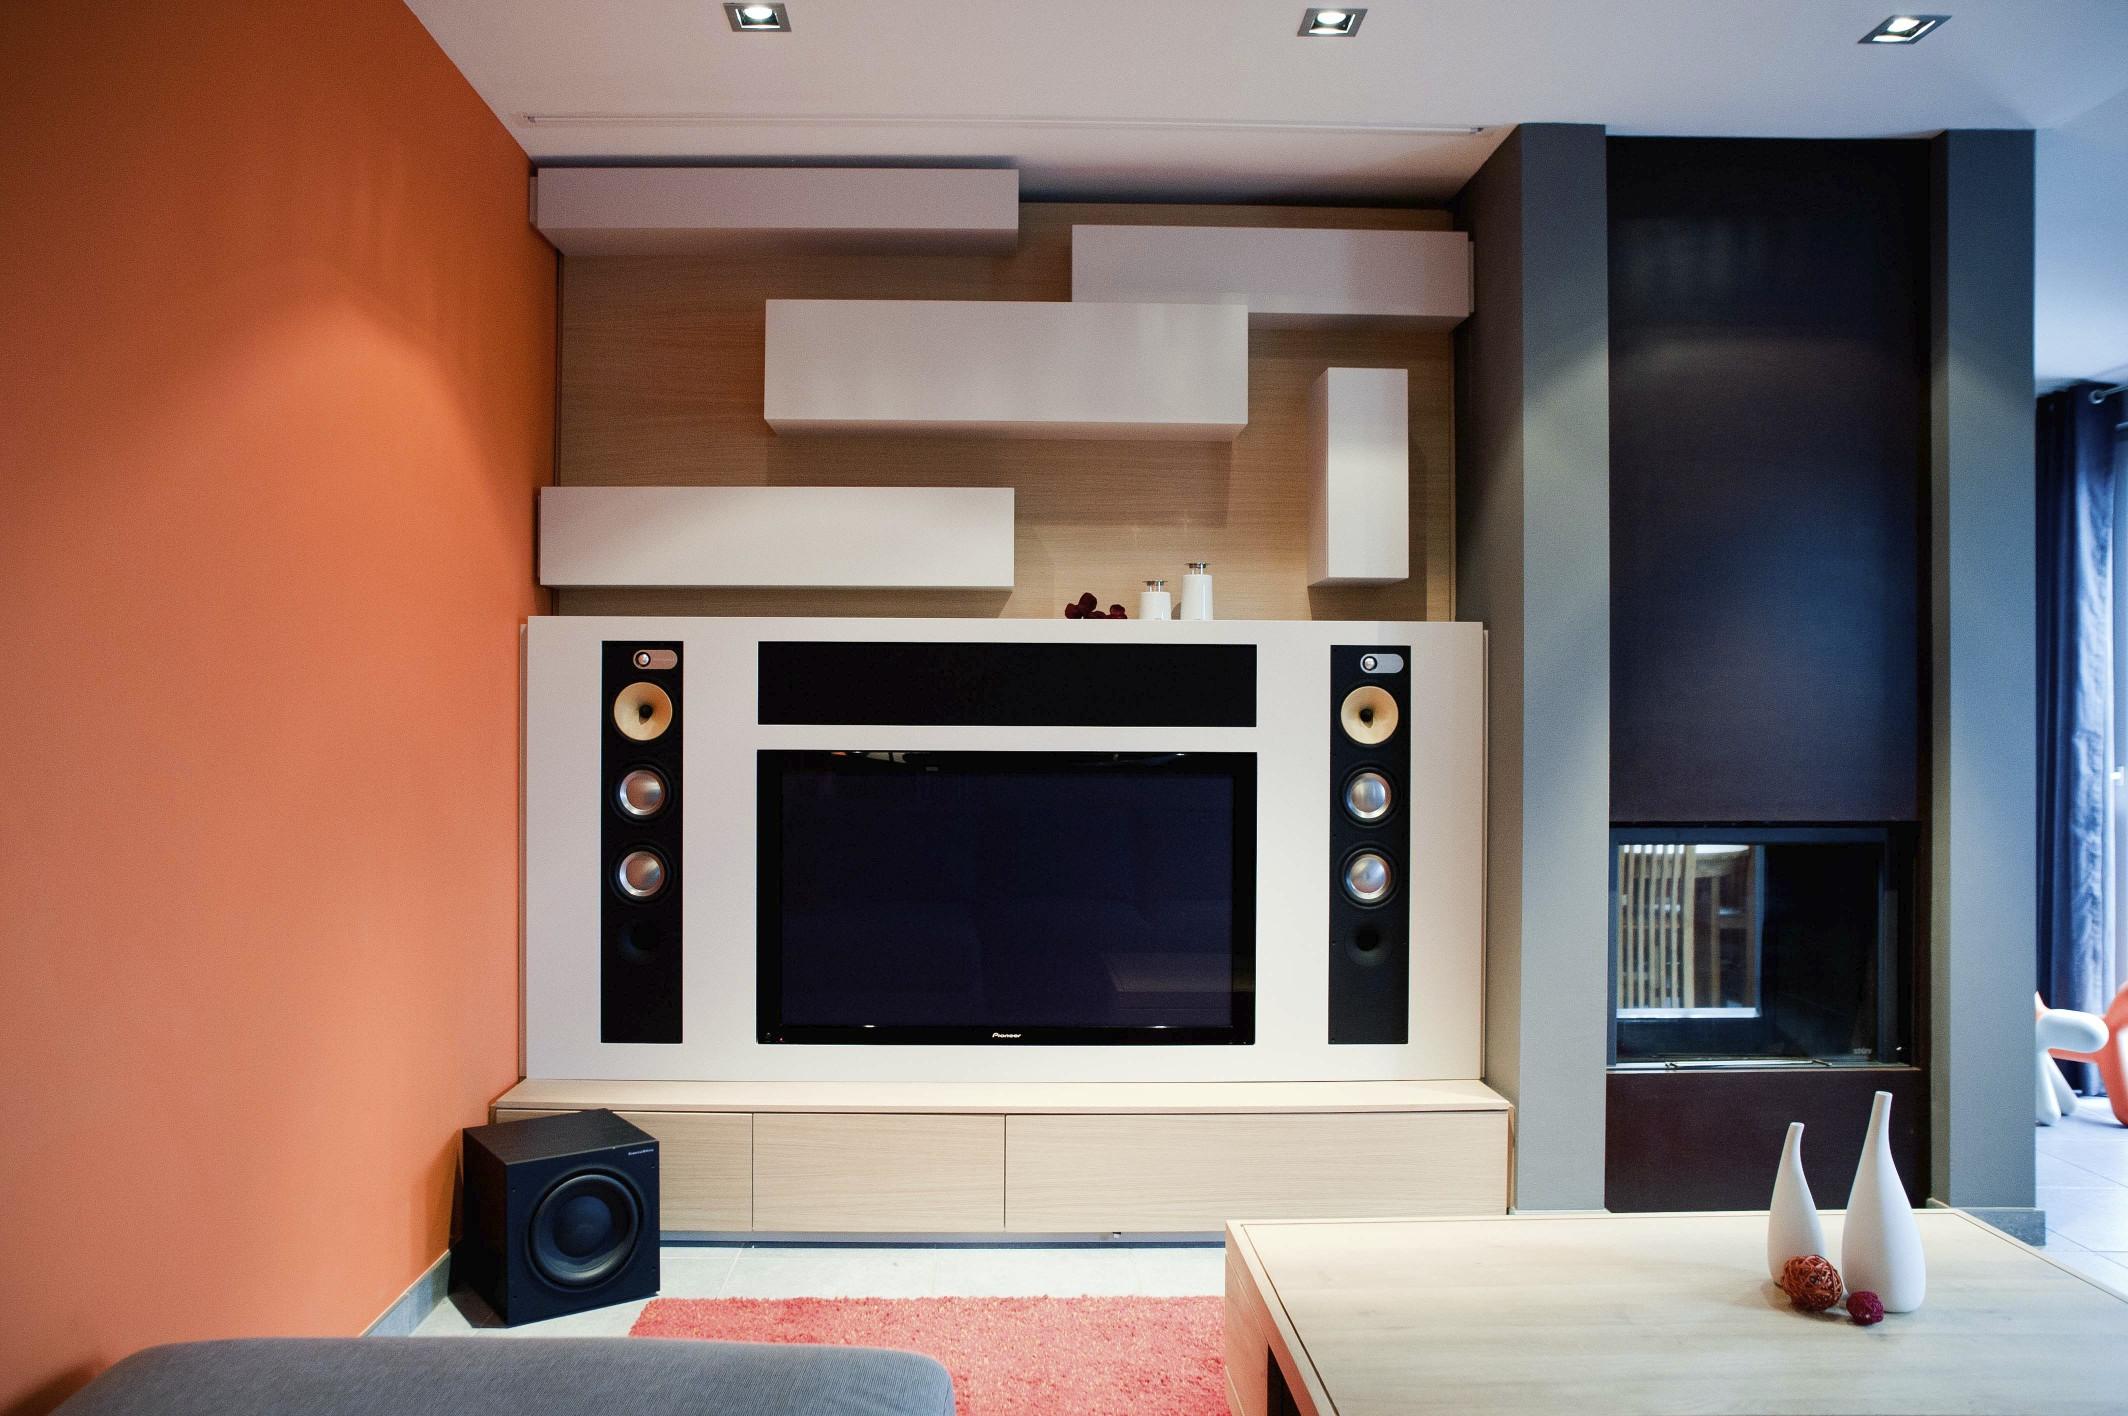 Tetrix - Julie Xhauflaire - appartement à Houffalize - #interior design #modern furniture